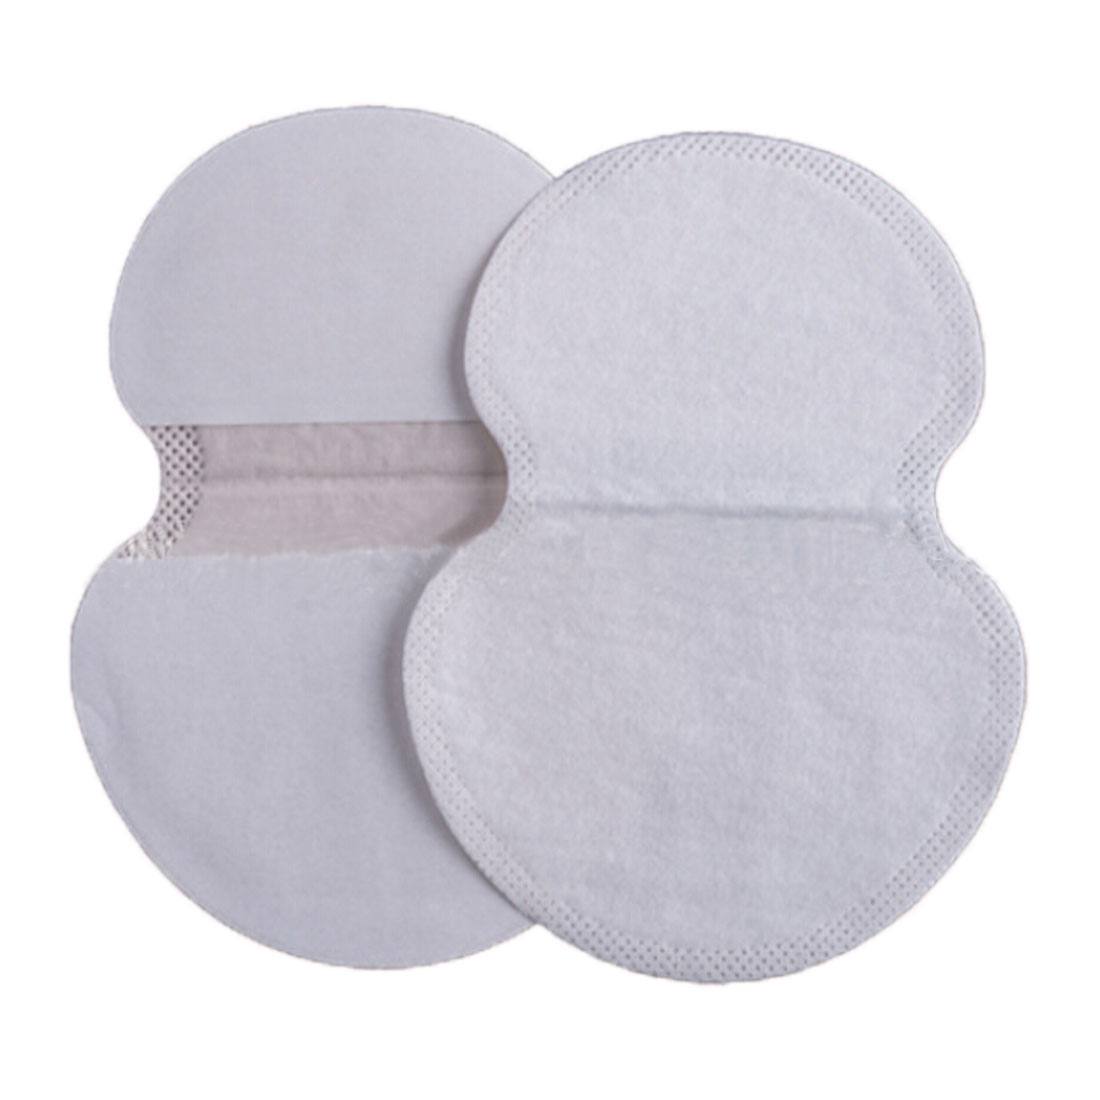 50pcs / 24pcs / 10pcs Underarm Dress Clothing Armpit Care Sweat Scent Perspiration Pad Shield Absorbing Deodorant Antiperspirant 4